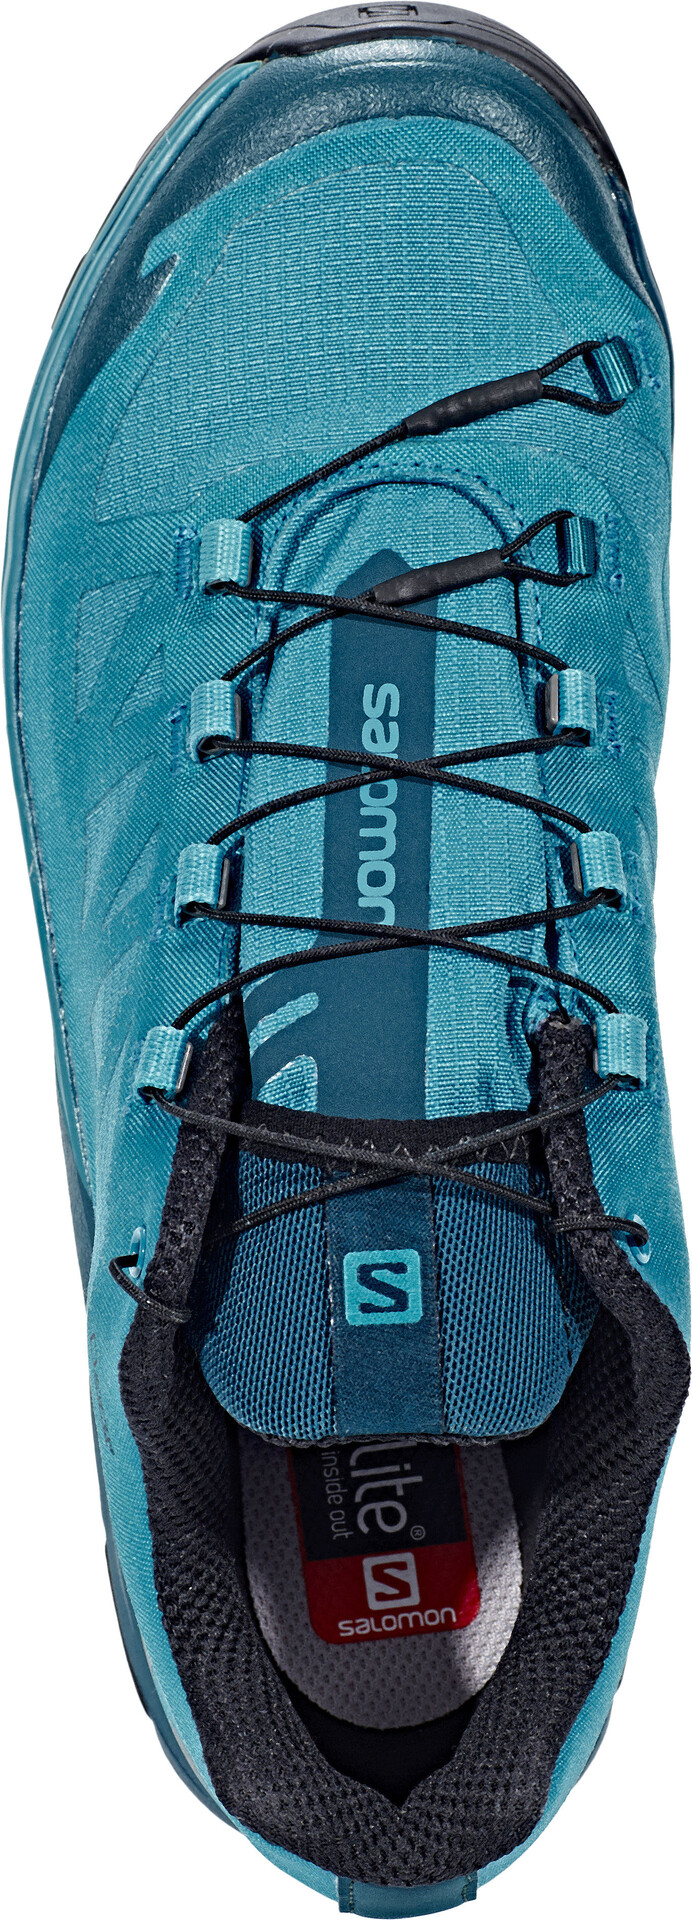 Salomon X Ultra LTR GTX Sko Damer, slatebluedeep bluespa blue